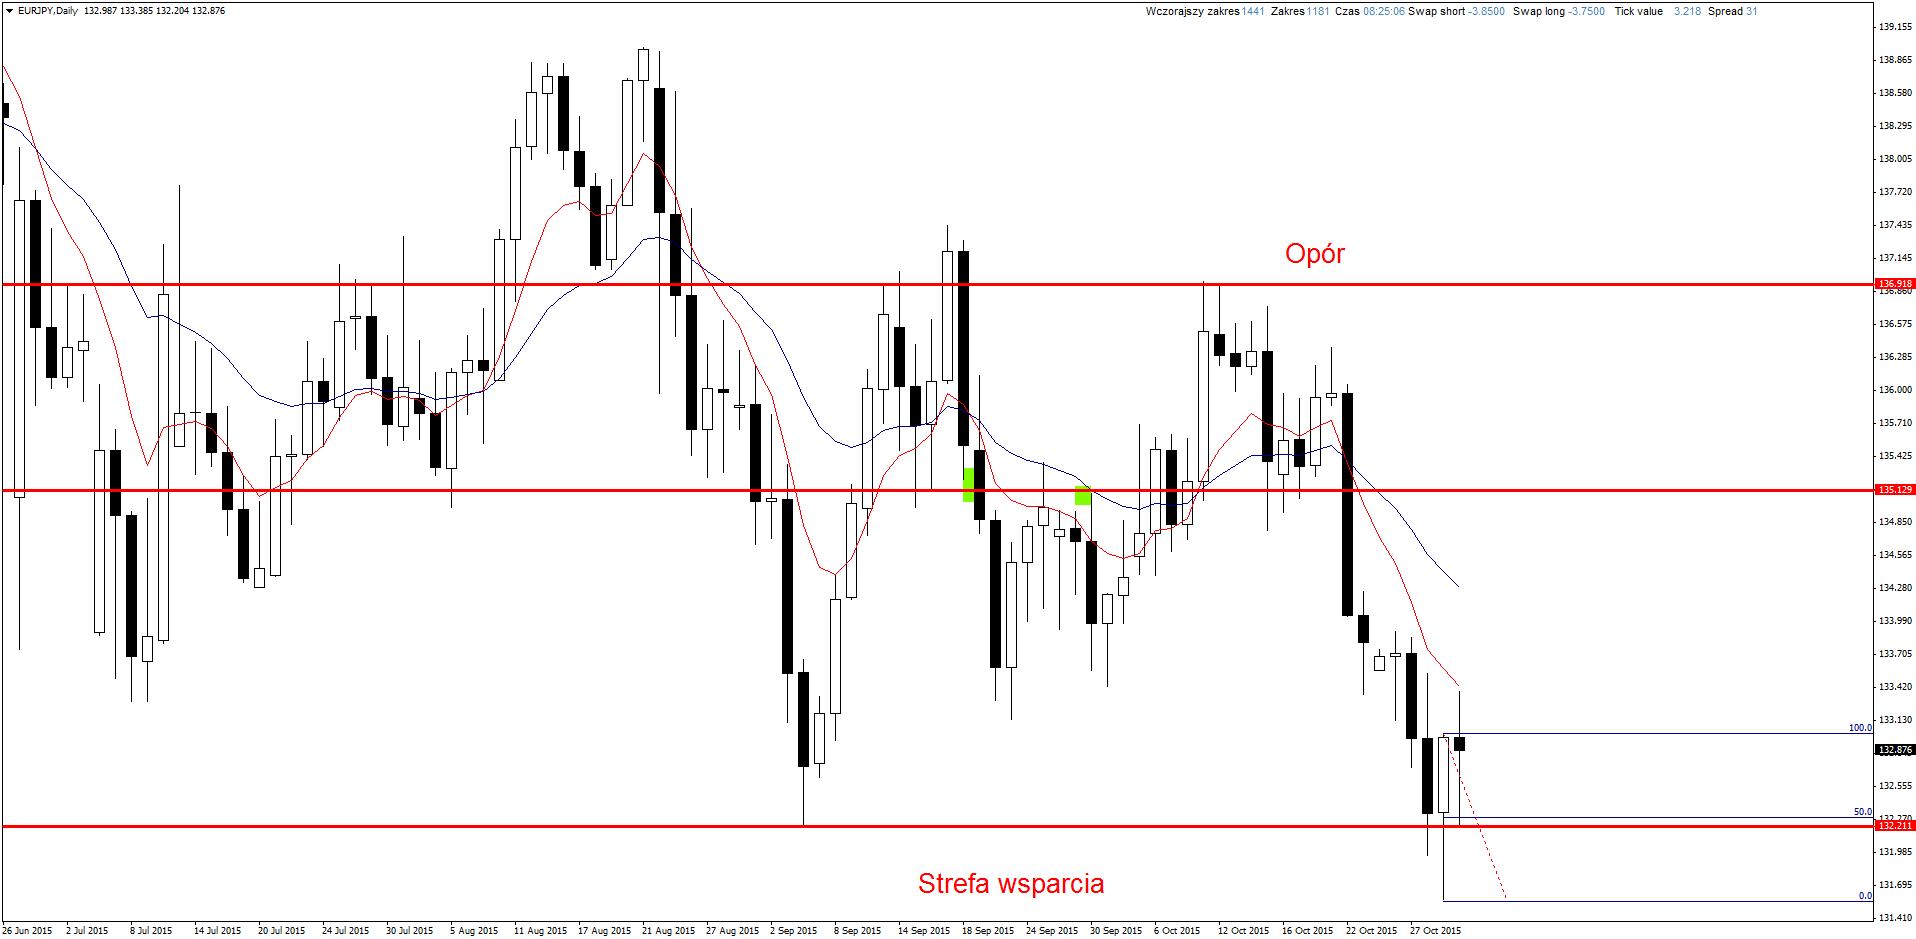 Hector deville trend scanner forex currency index